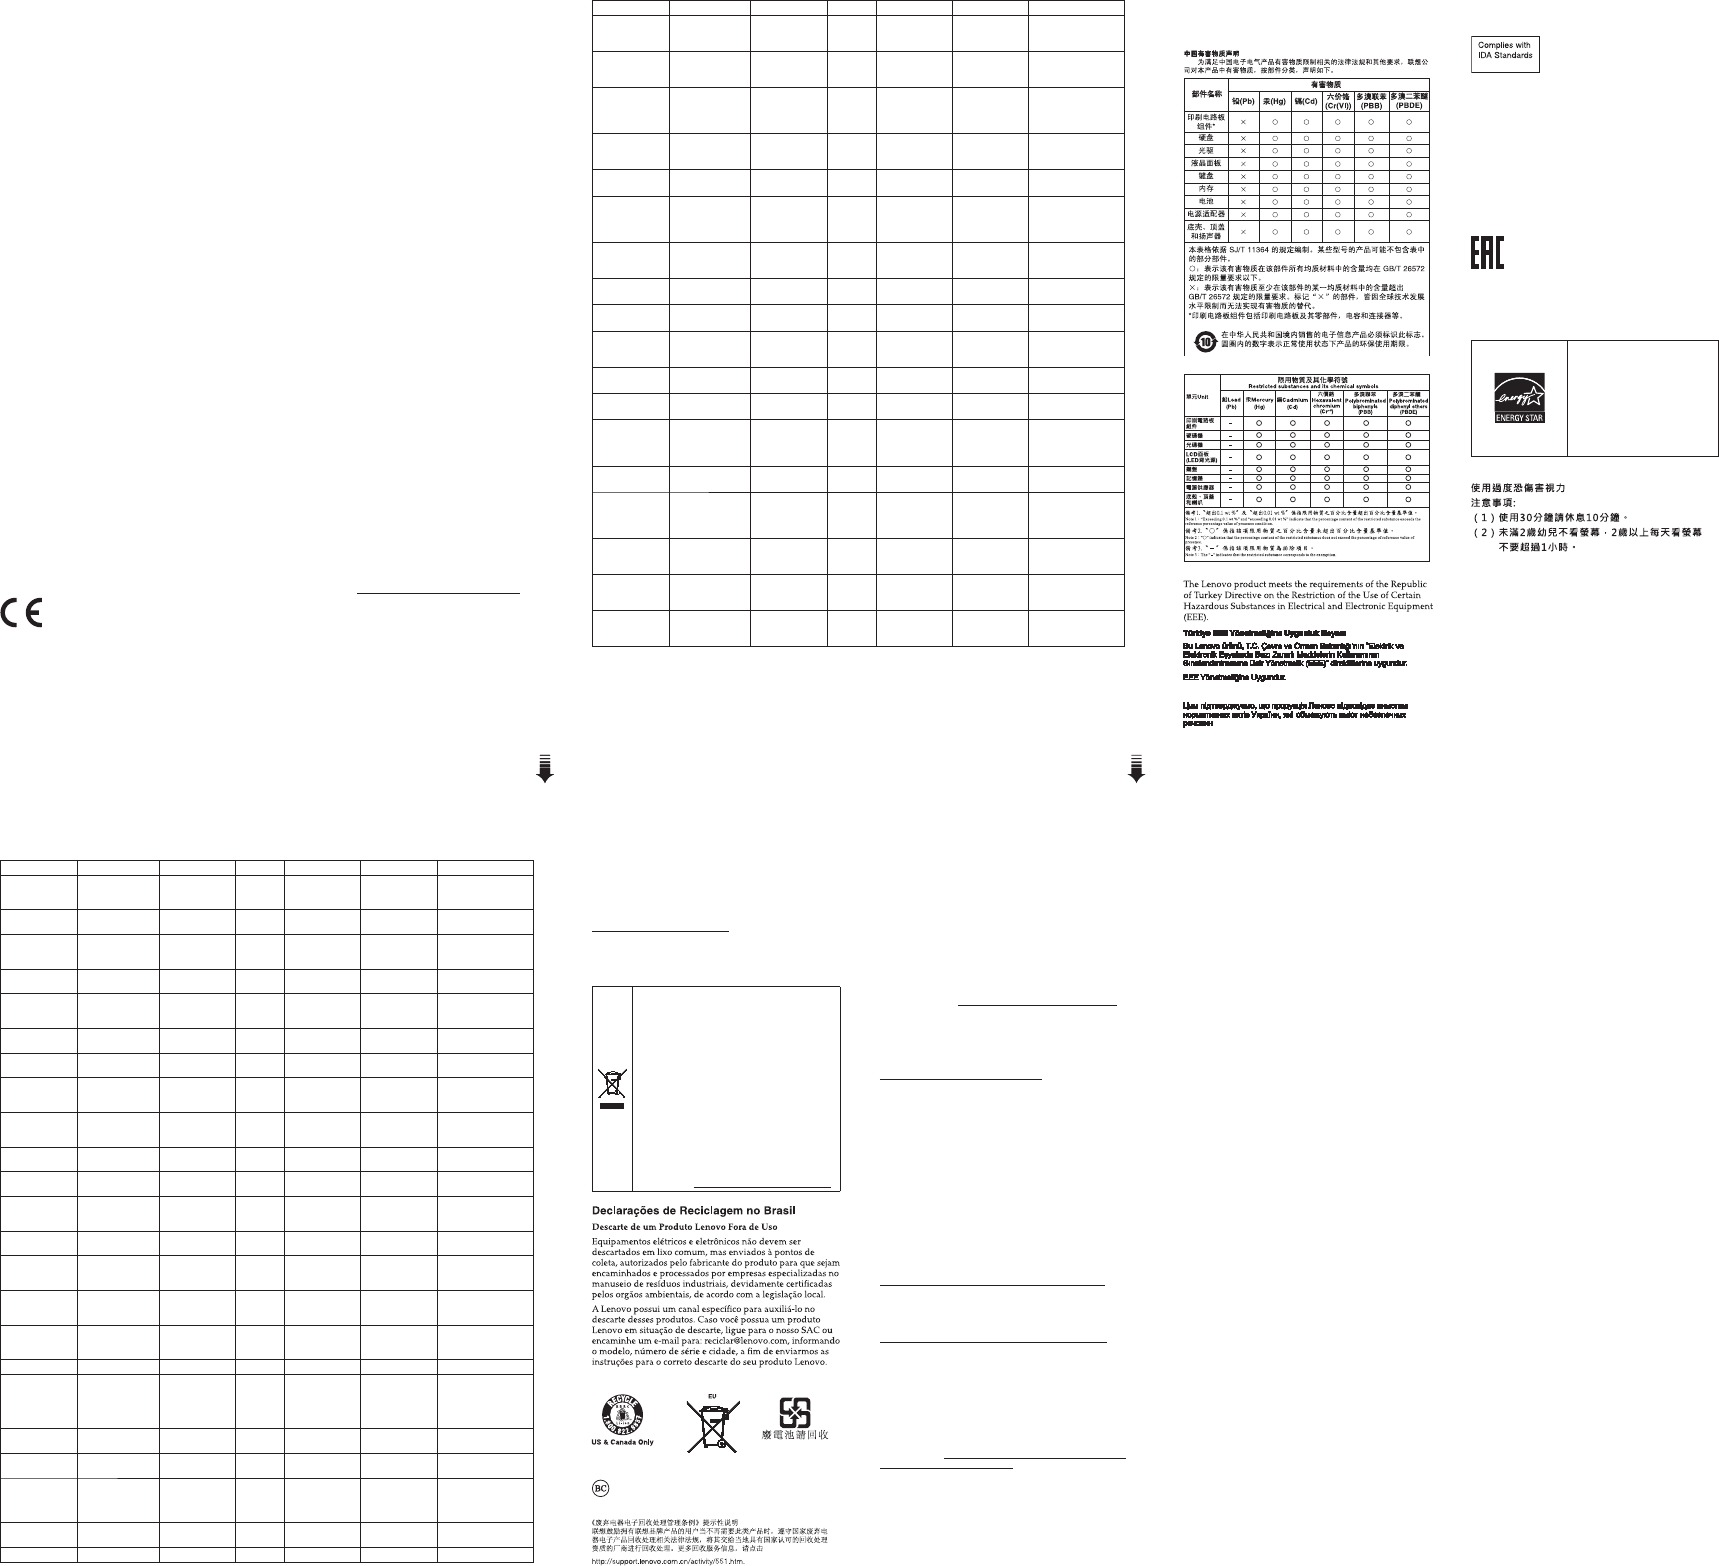 Lenovo Ideapad520 15ikb 520x Swsg Es 201705 Ideapad 520 Sp 02 User  # Muebles Fourcade Limitada